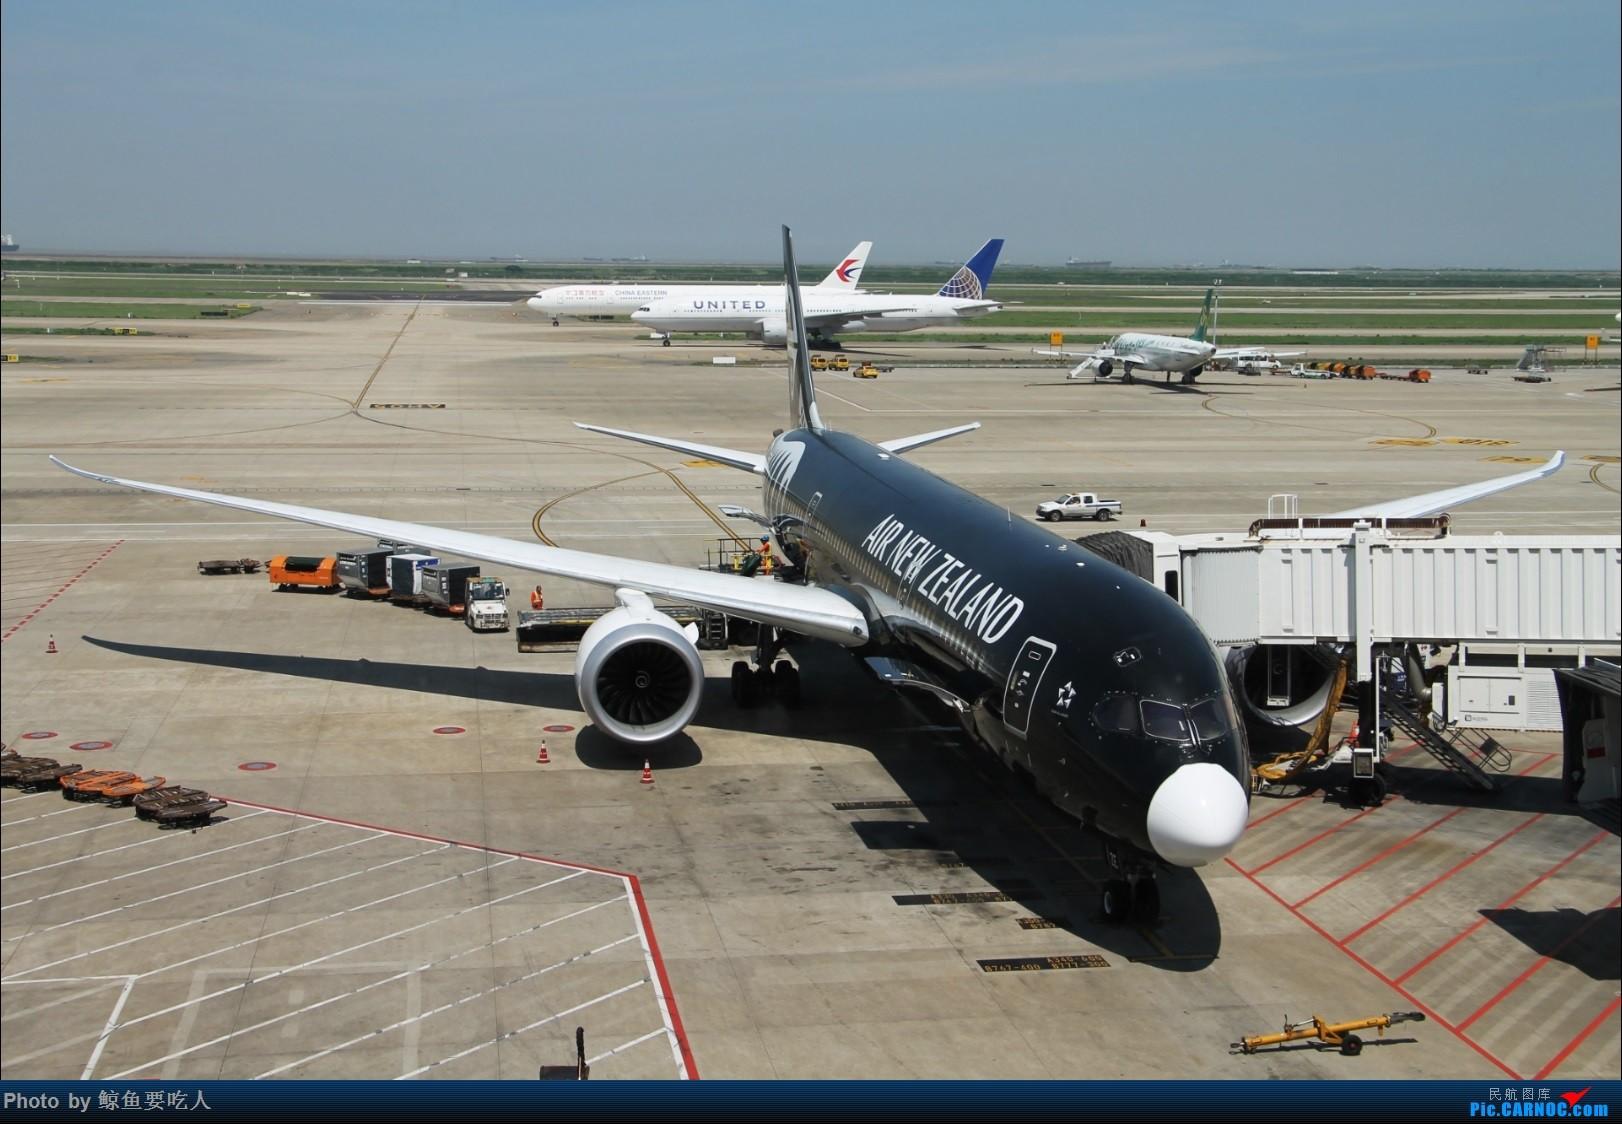 Re:[原创]暑期加拿大西部 交换学习四周 AC026 上海PVG--温哥华YVR B789初体验 经济舱客机餐食、设备一览,外加浦东众多外航客机 BOEING 787-9